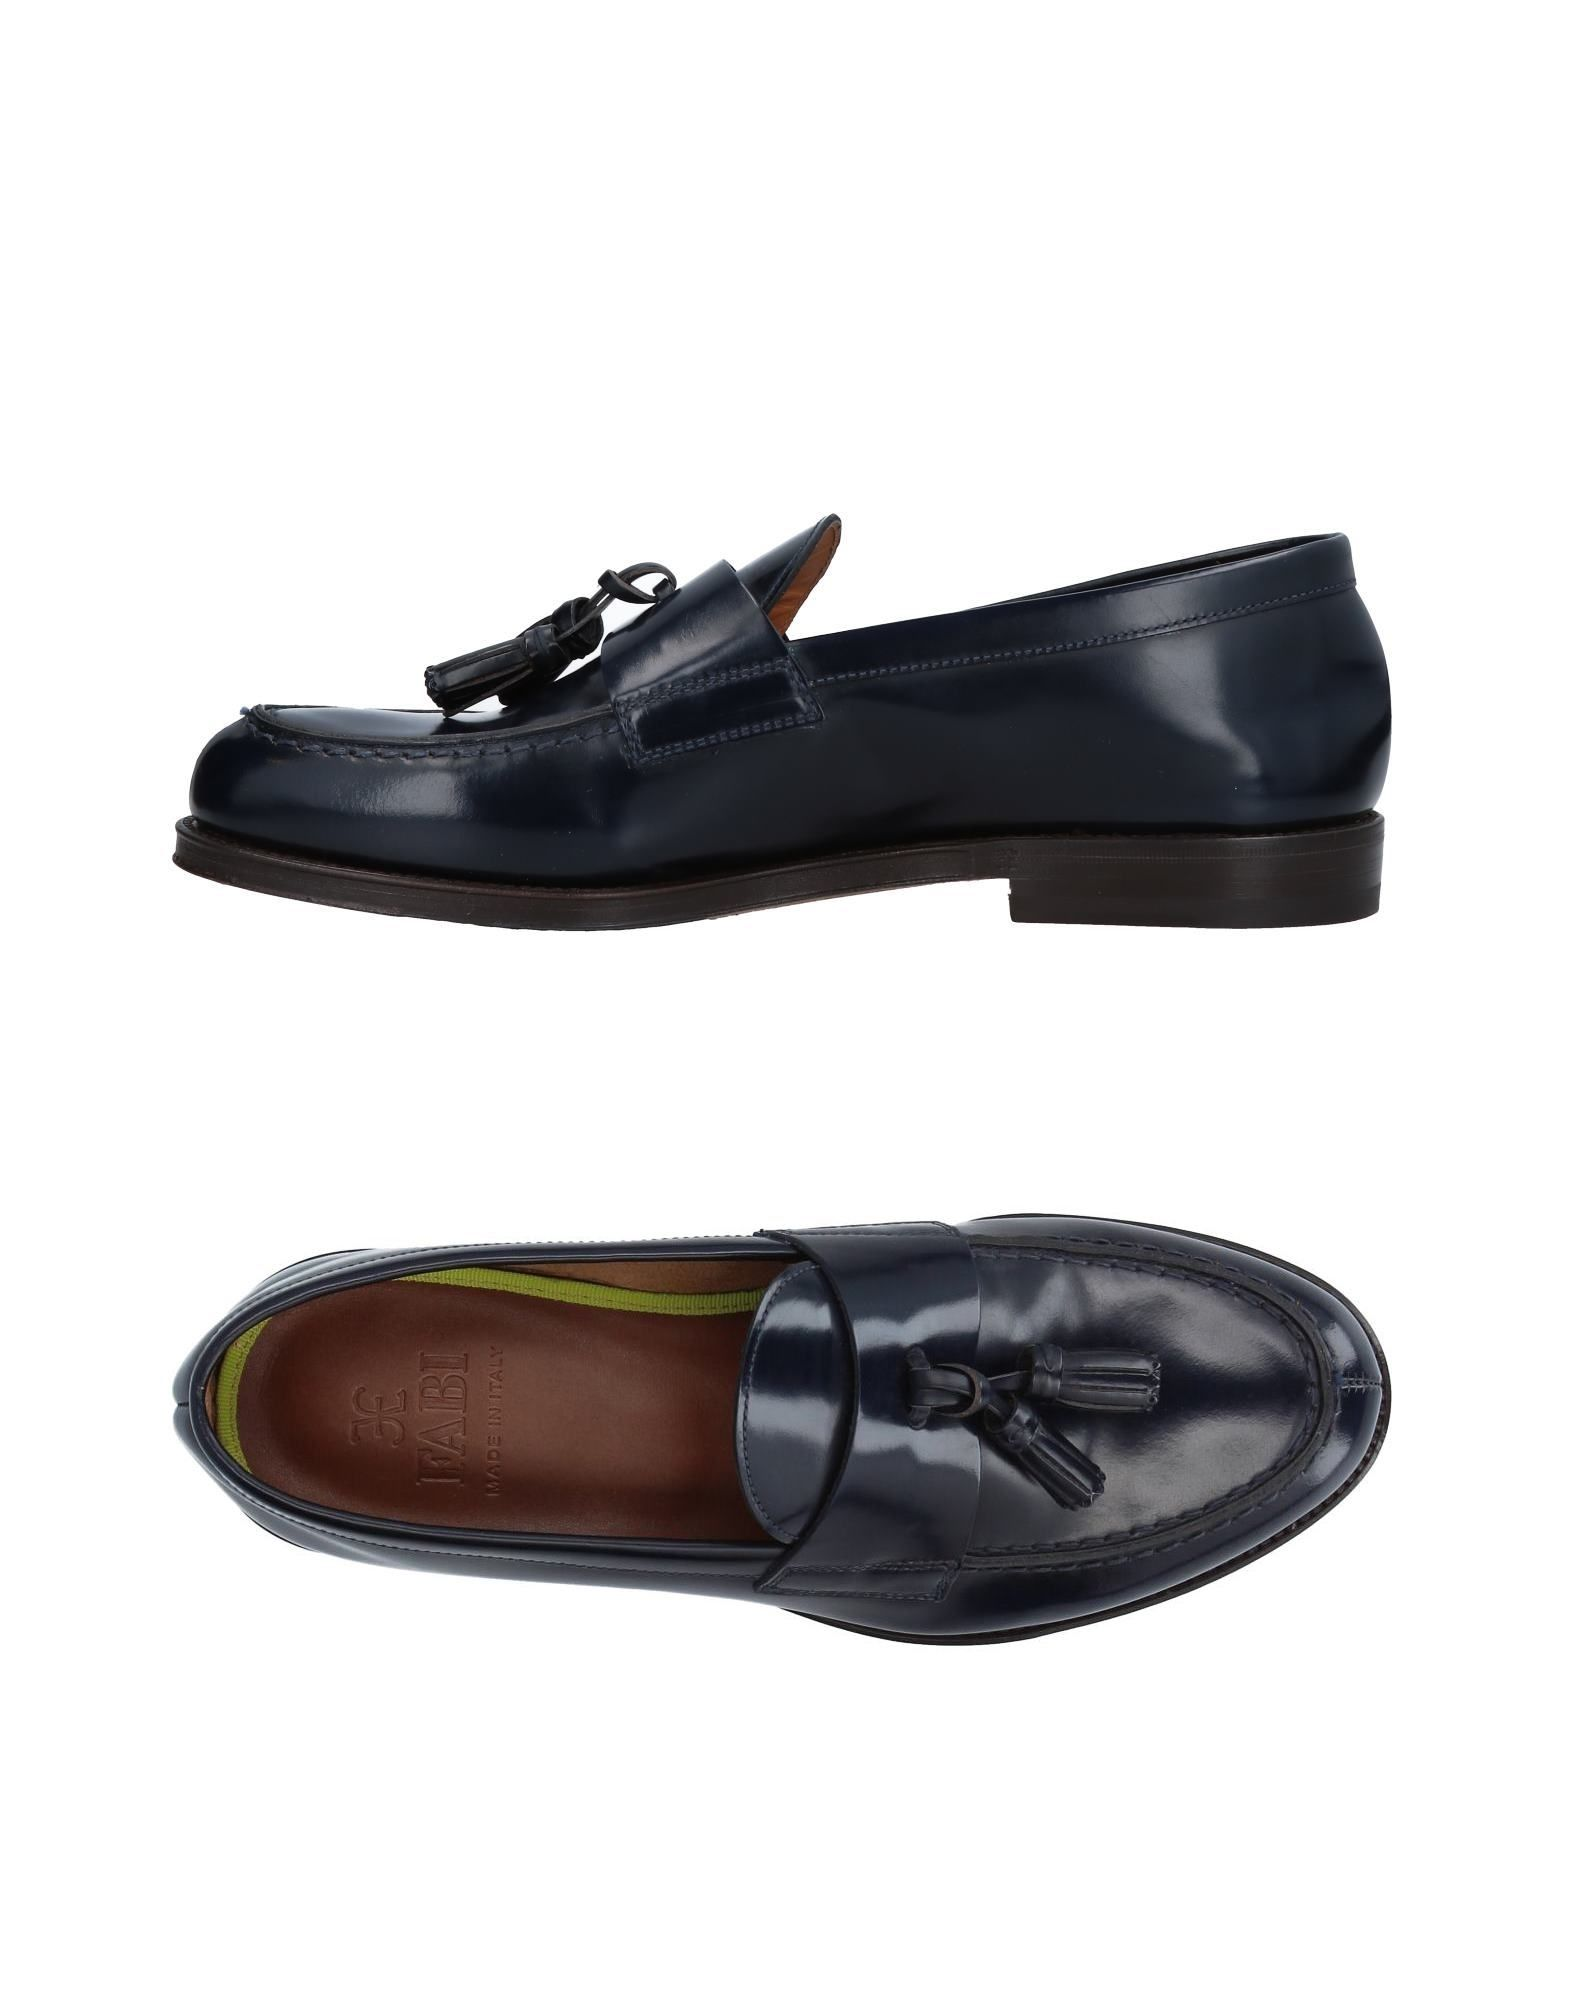 Fabi Mokassins Herren  11415863BT Gute Qualität beliebte Schuhe